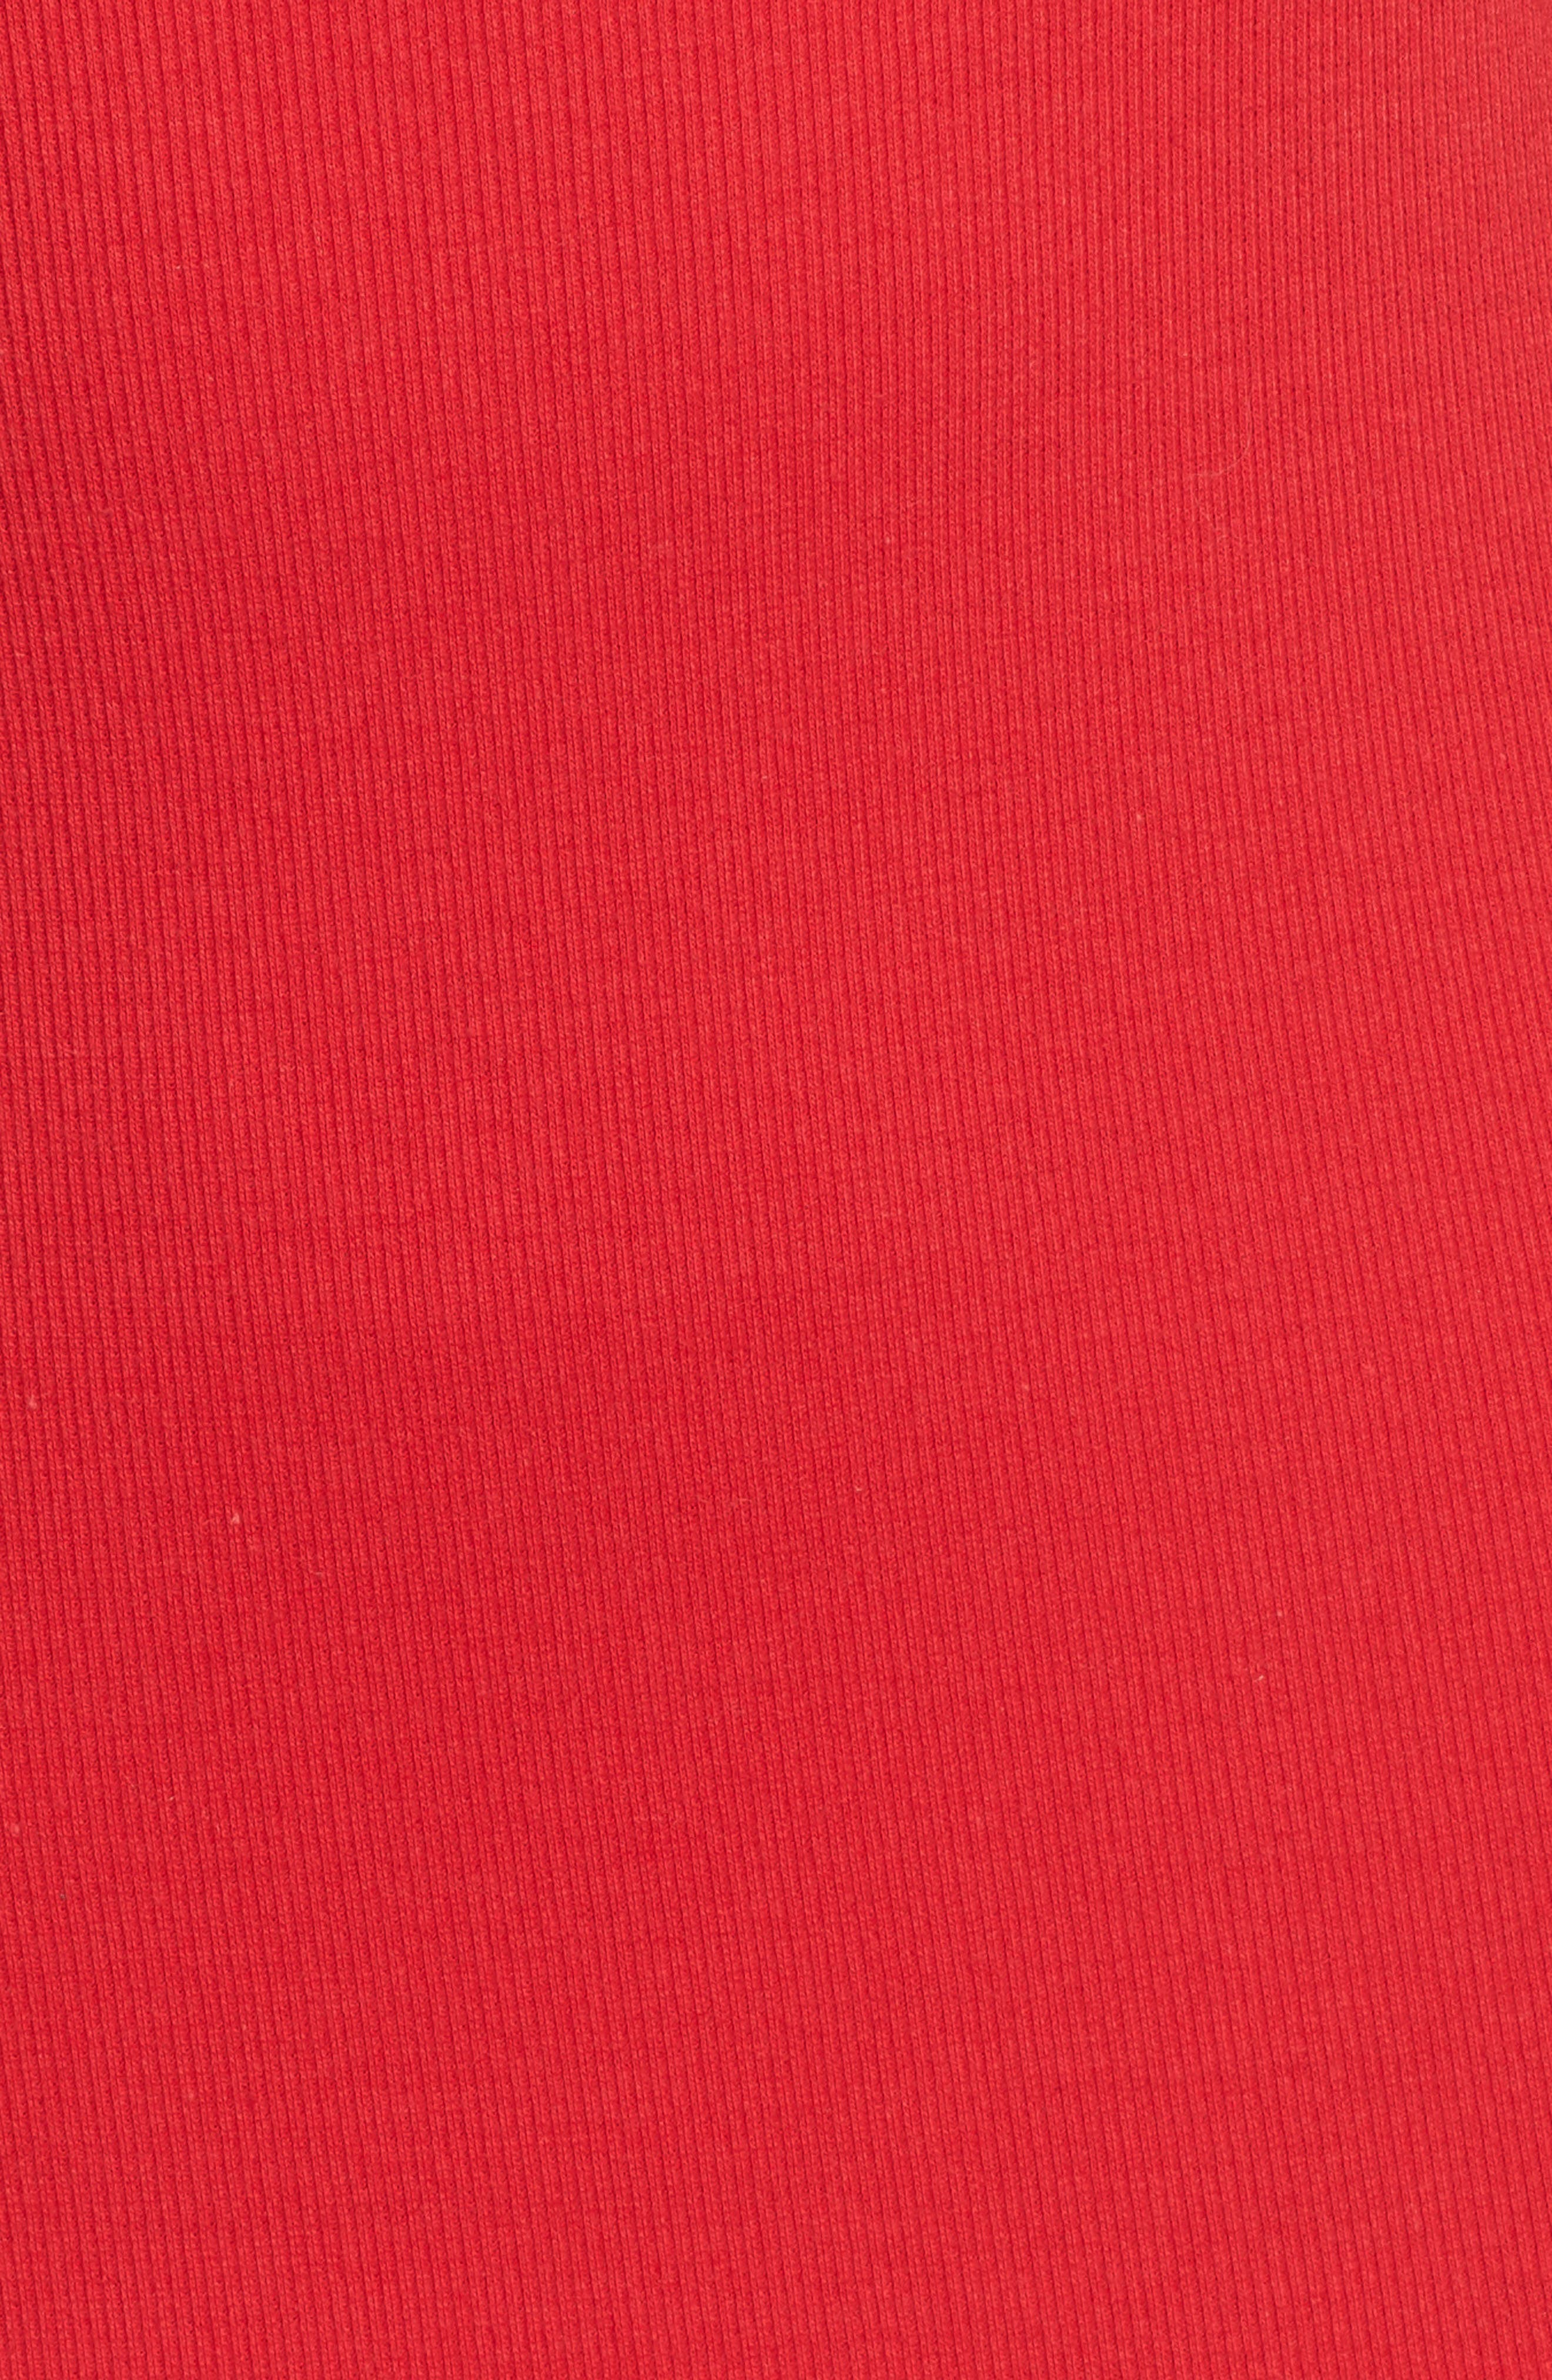 Cutout Dress,                             Alternate thumbnail 6, color,                             623